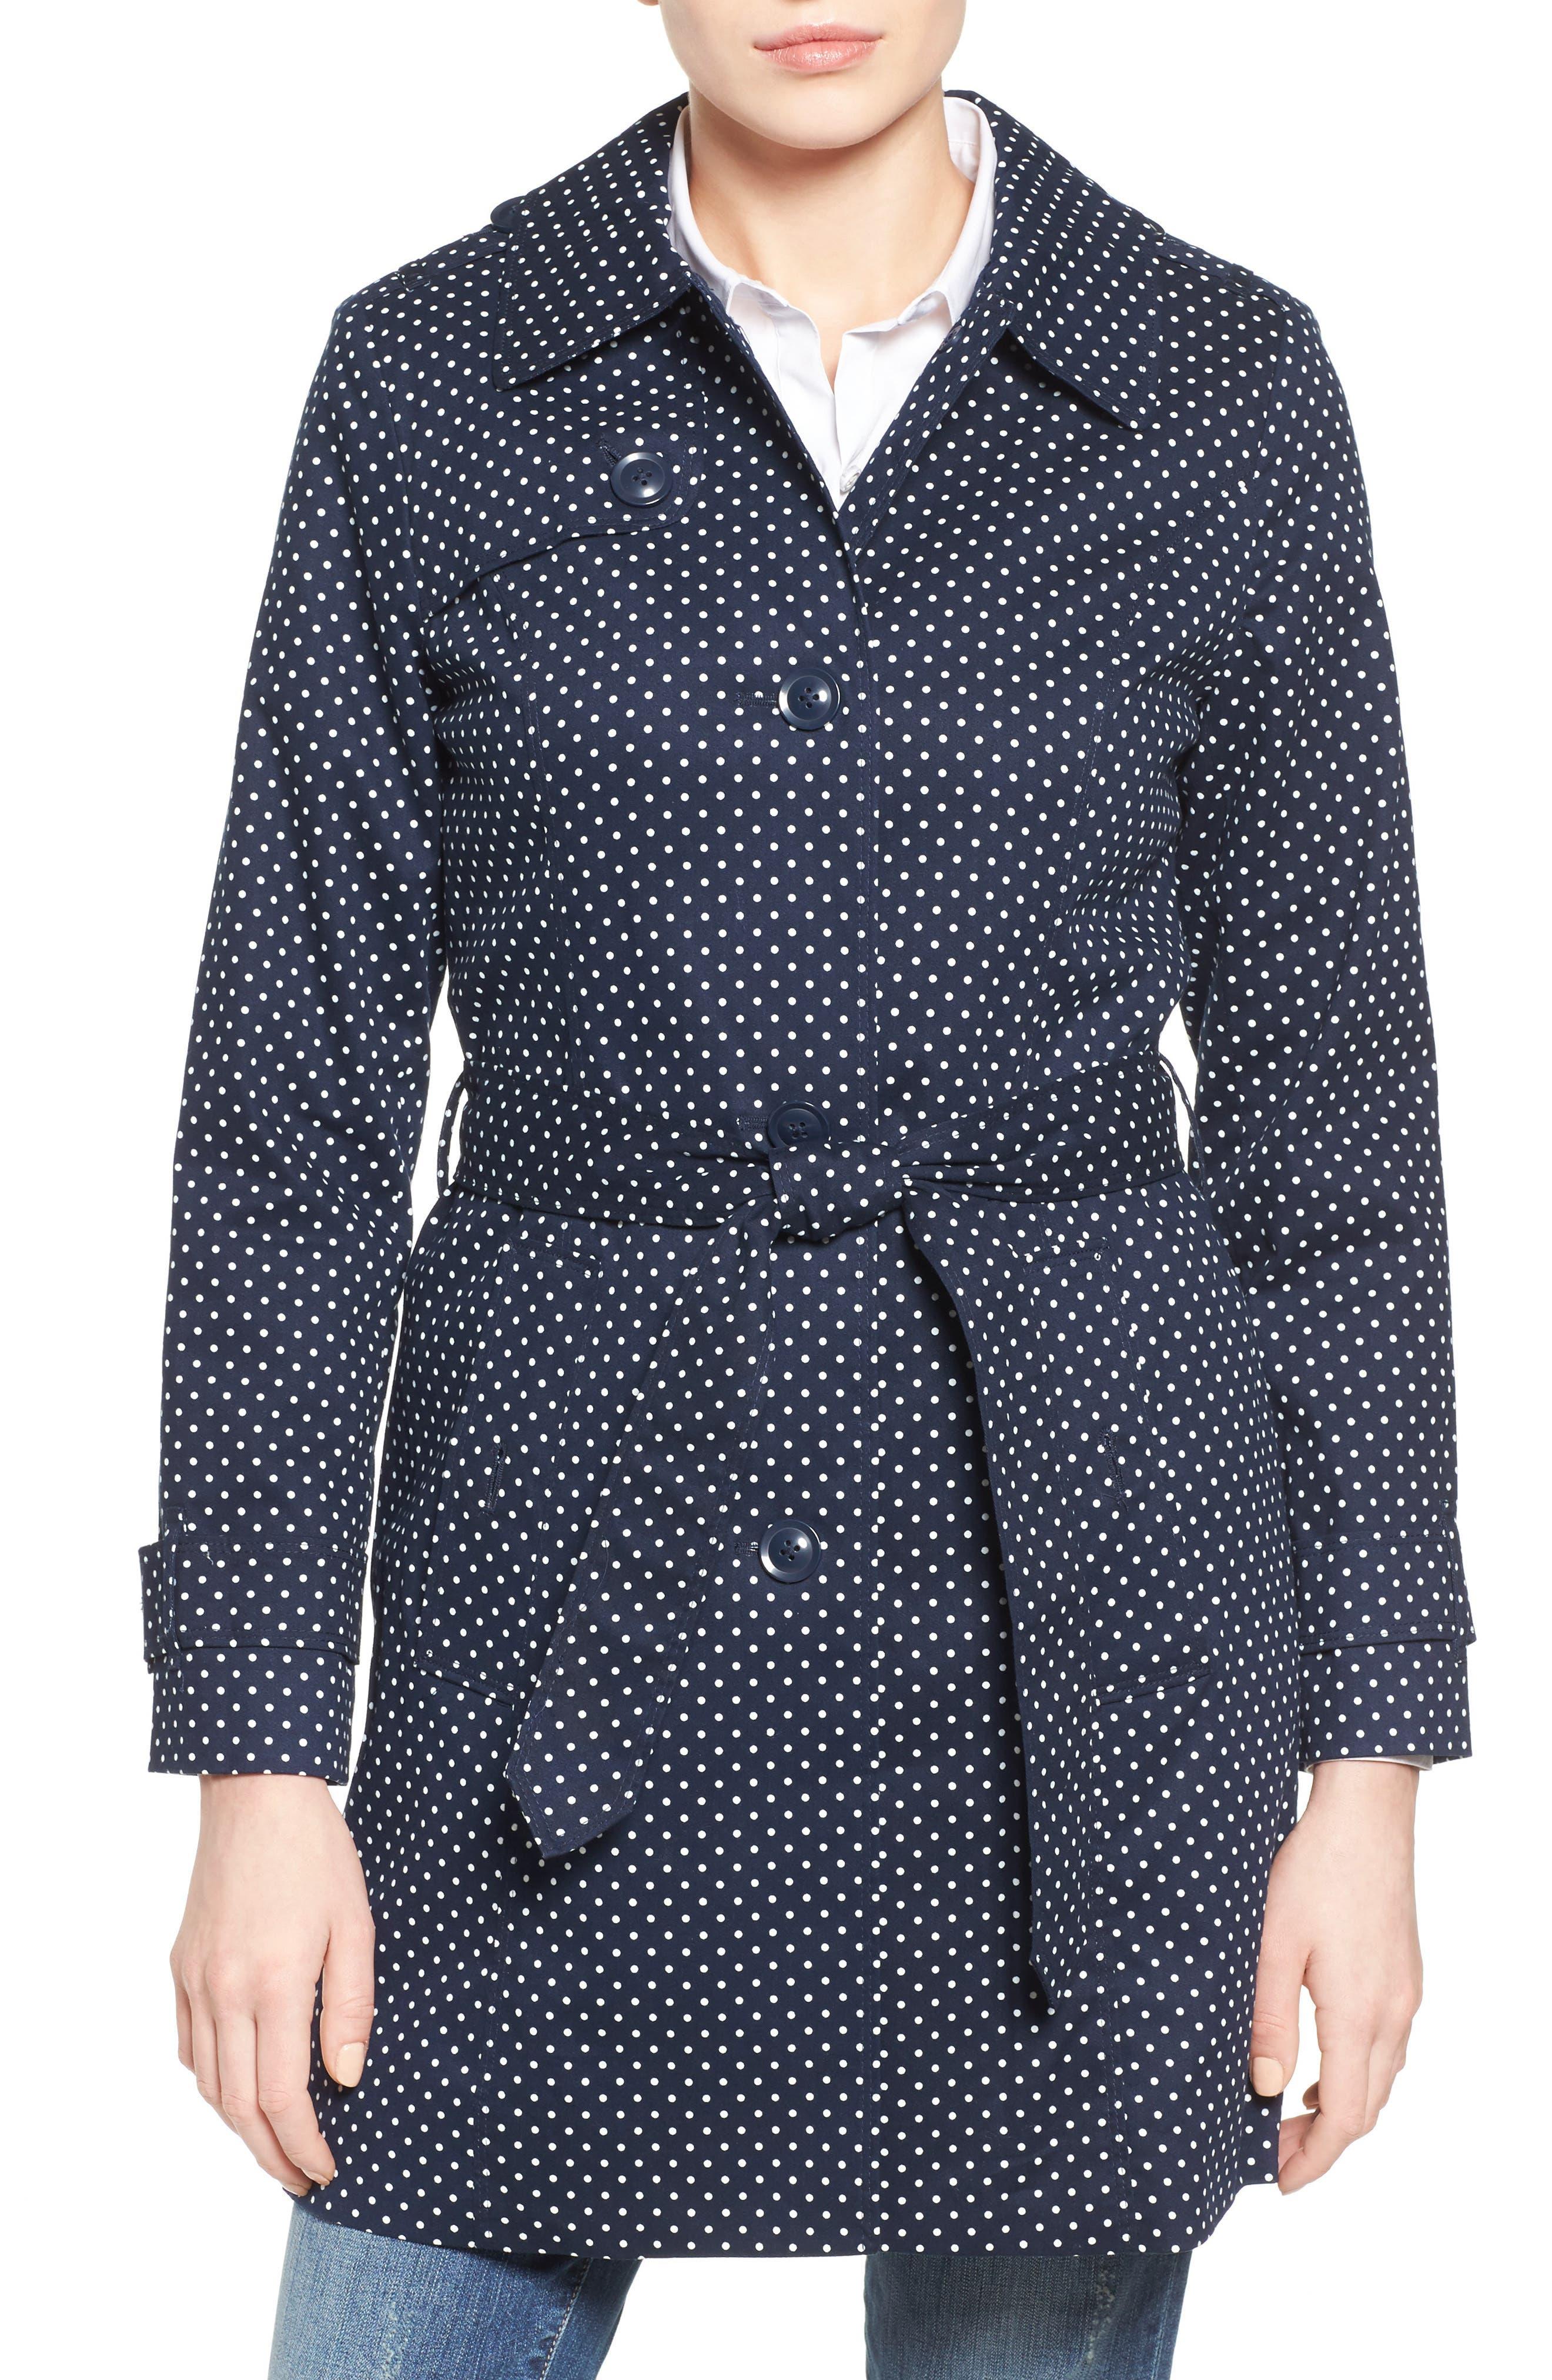 Alternate Image 1 Selected - London Fog Polka Dot Single Breasted Trench Coat (Regular & Petite)